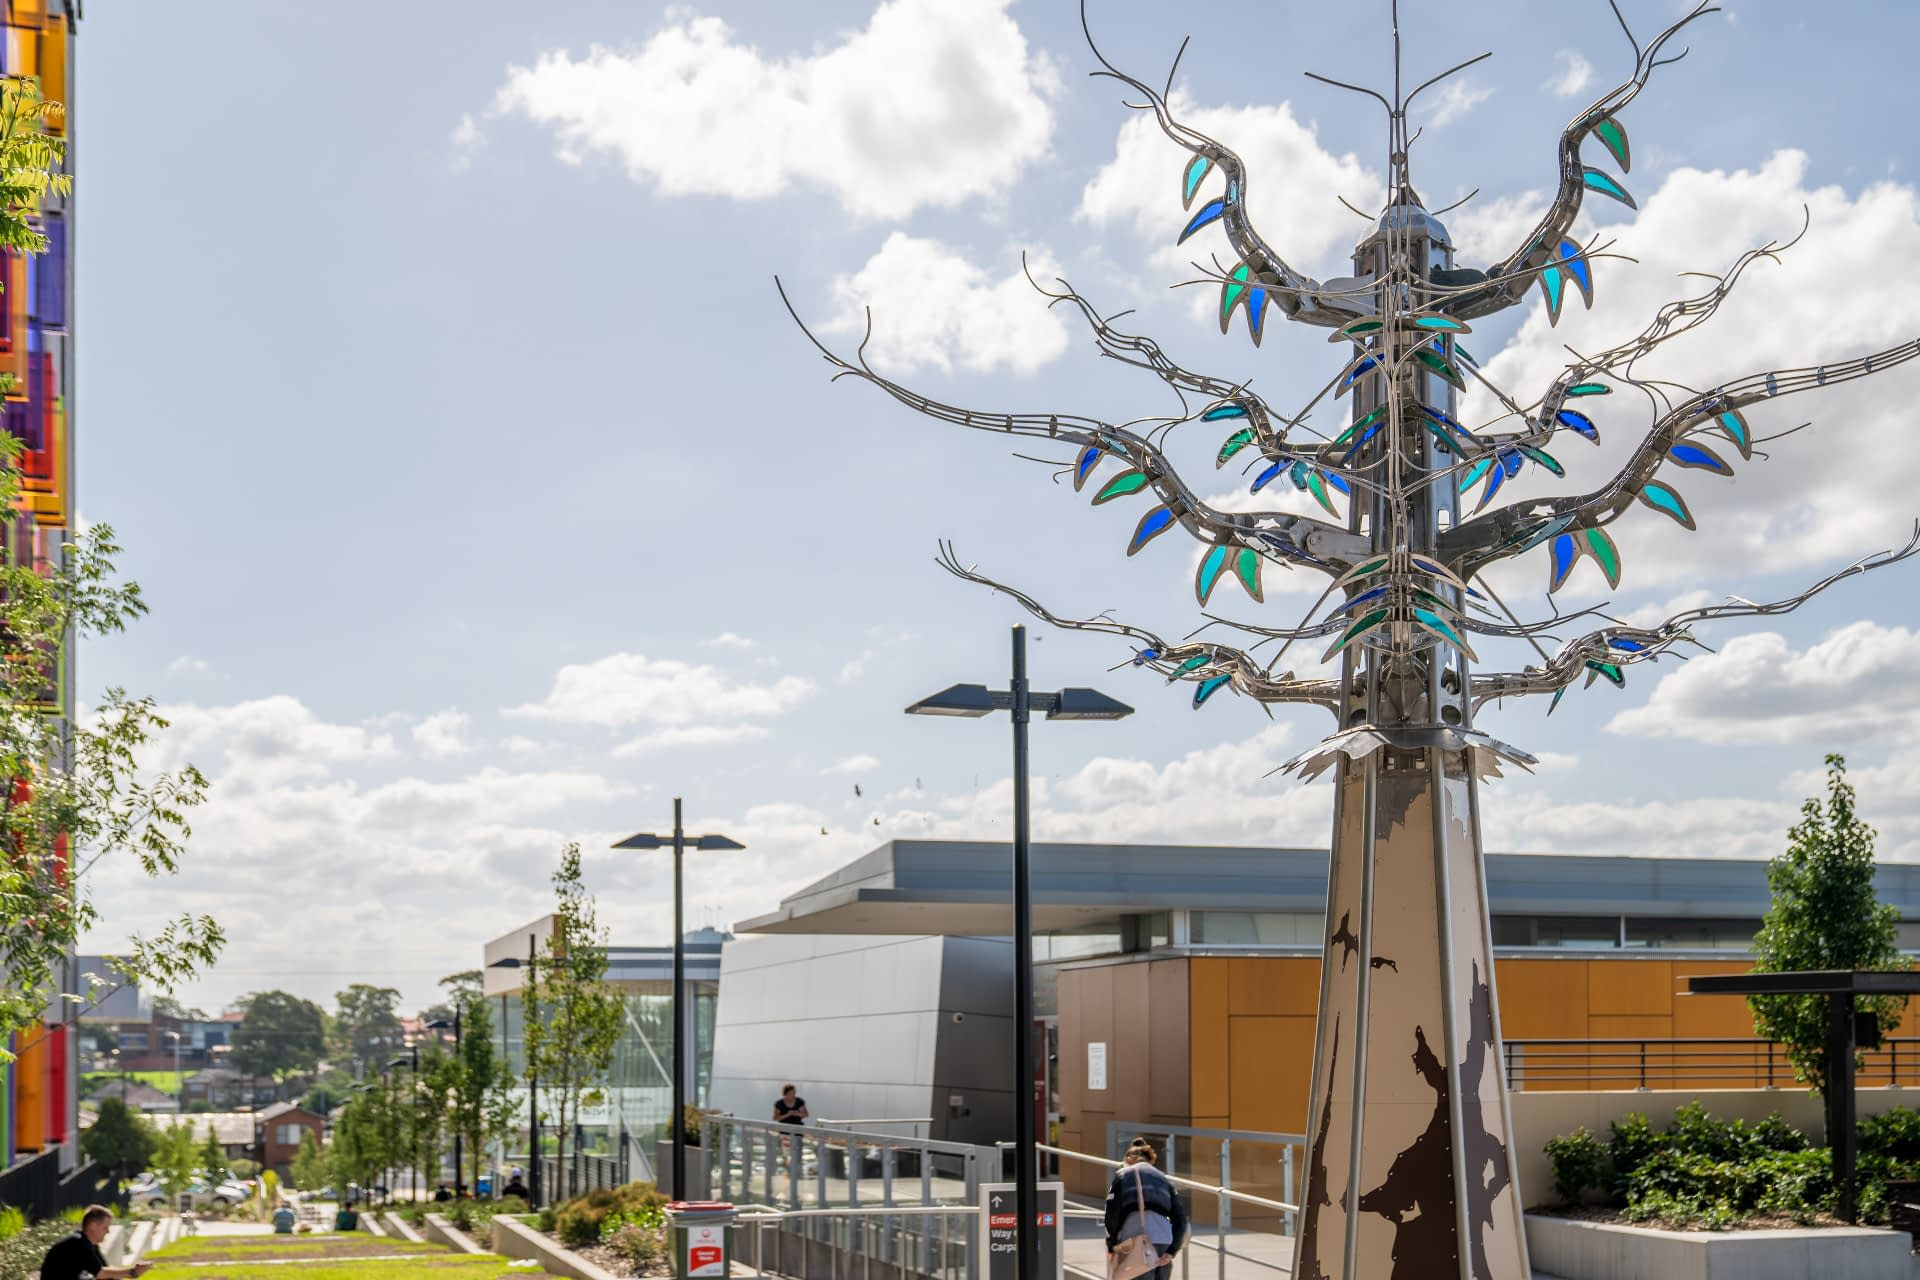 Djalgala Yarra - kinetic sculpture